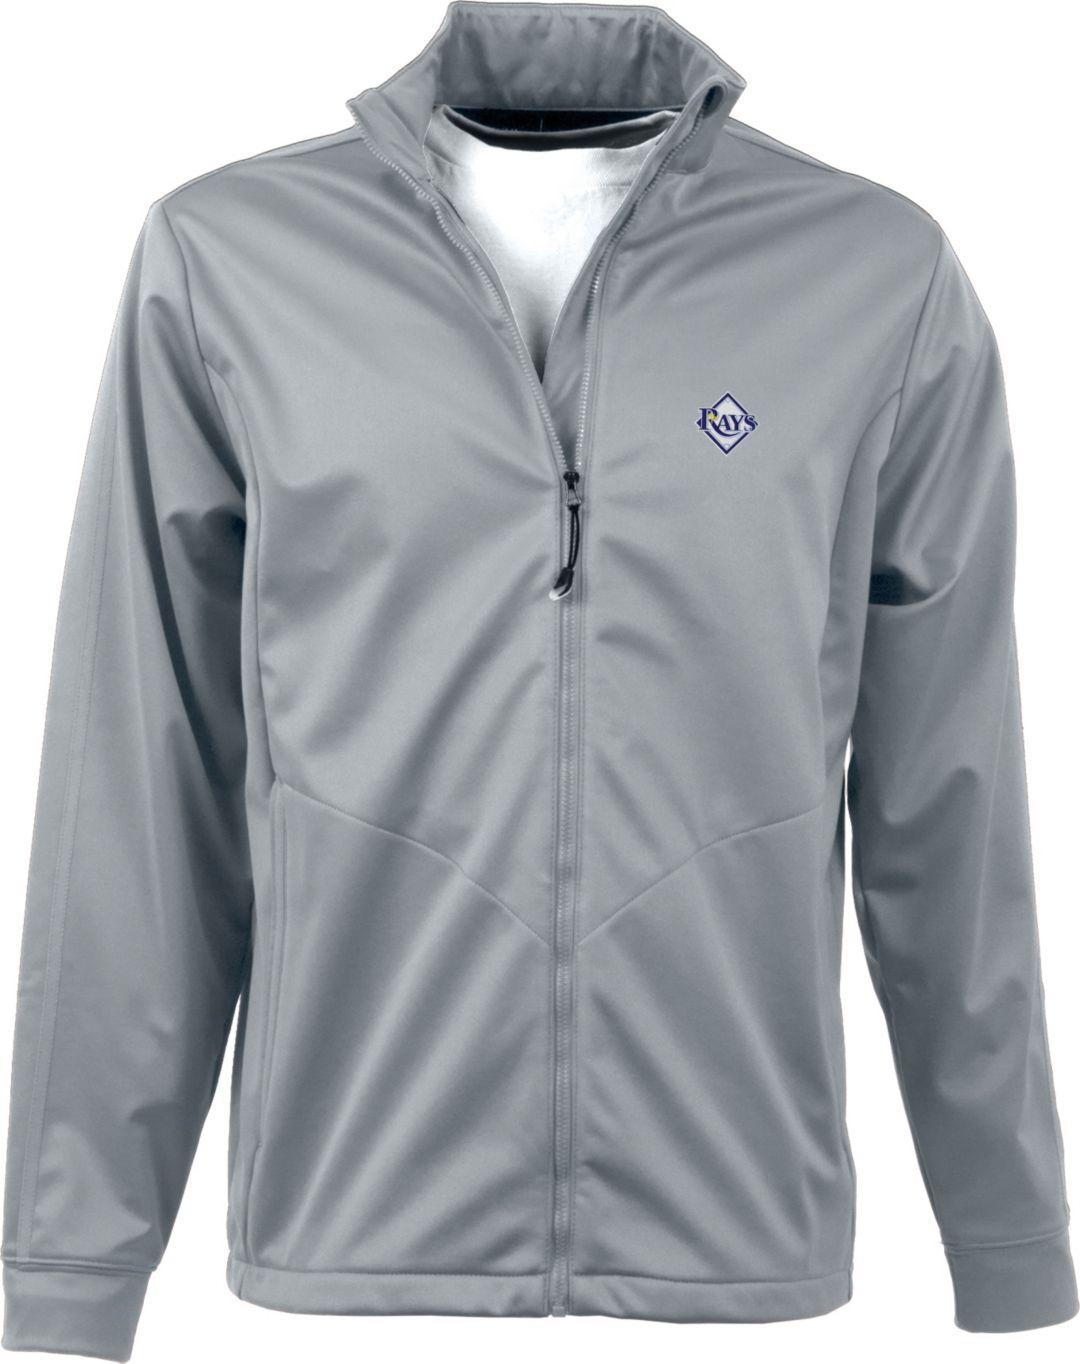 b305f7b4 Antigua Men's Tampa Bay Rays Full-Zip Silver Golf Jacket